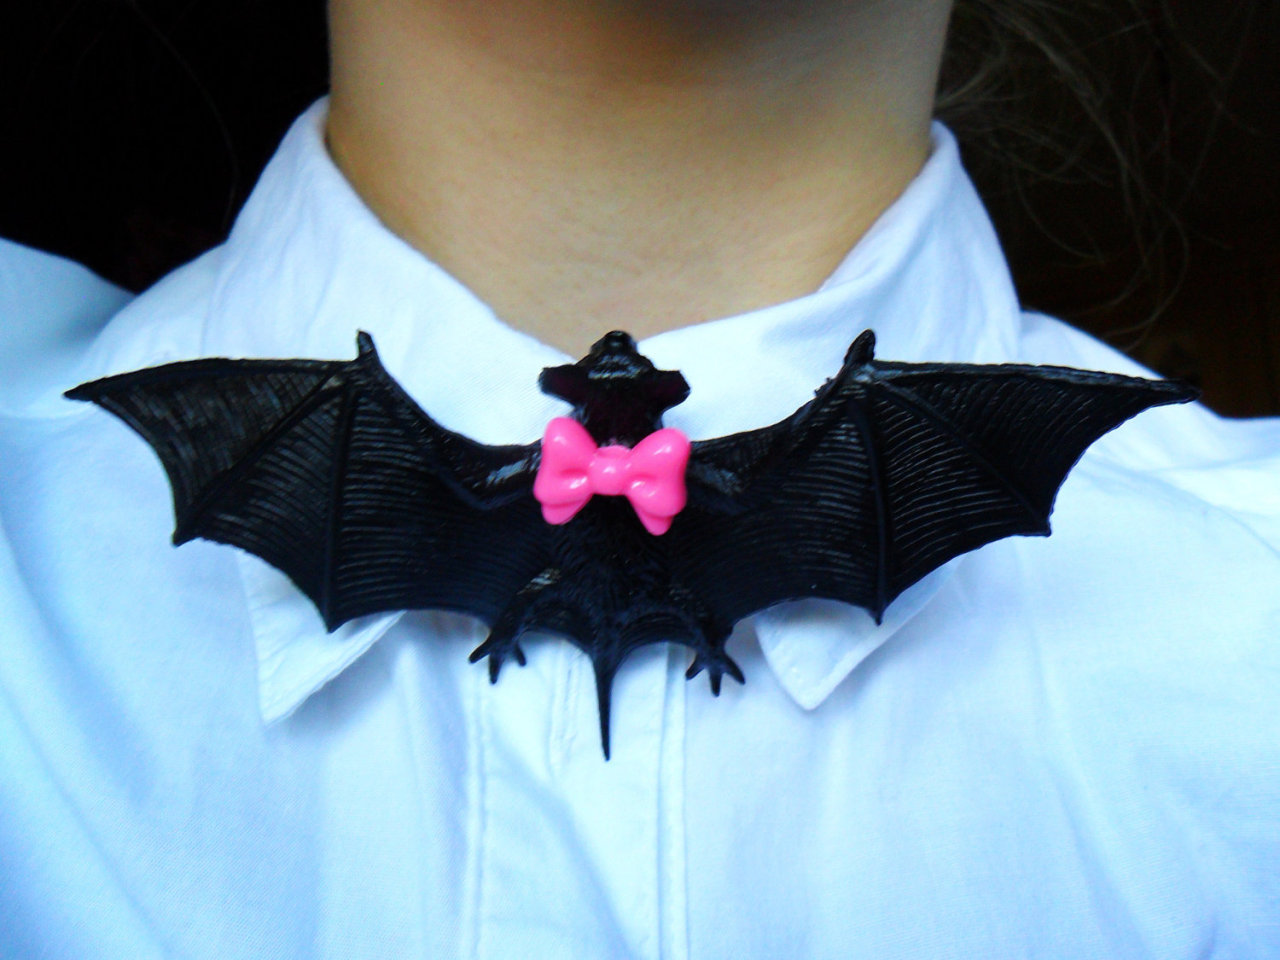 DIY novelty Bat Pin worn as a bowtie, I am so doing this!